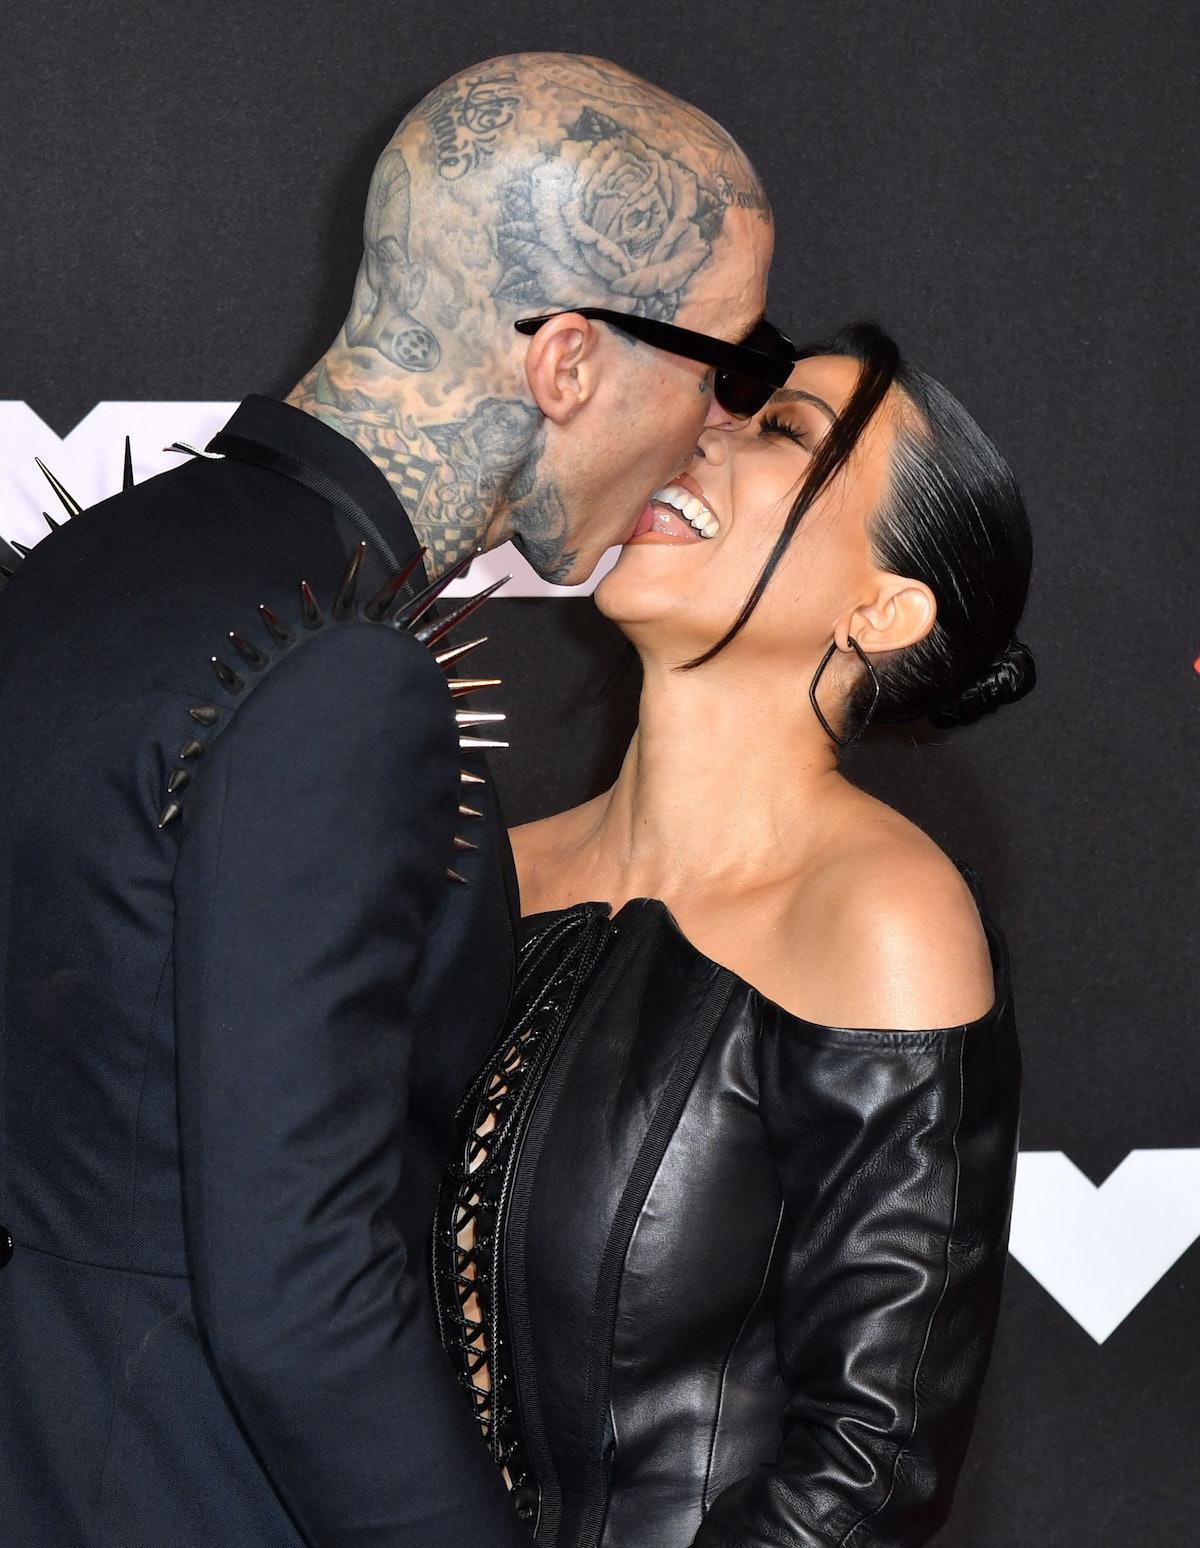 Travis Barker and Kourtney Kardashian kissing on the red carpet at the 2021 VMAs.